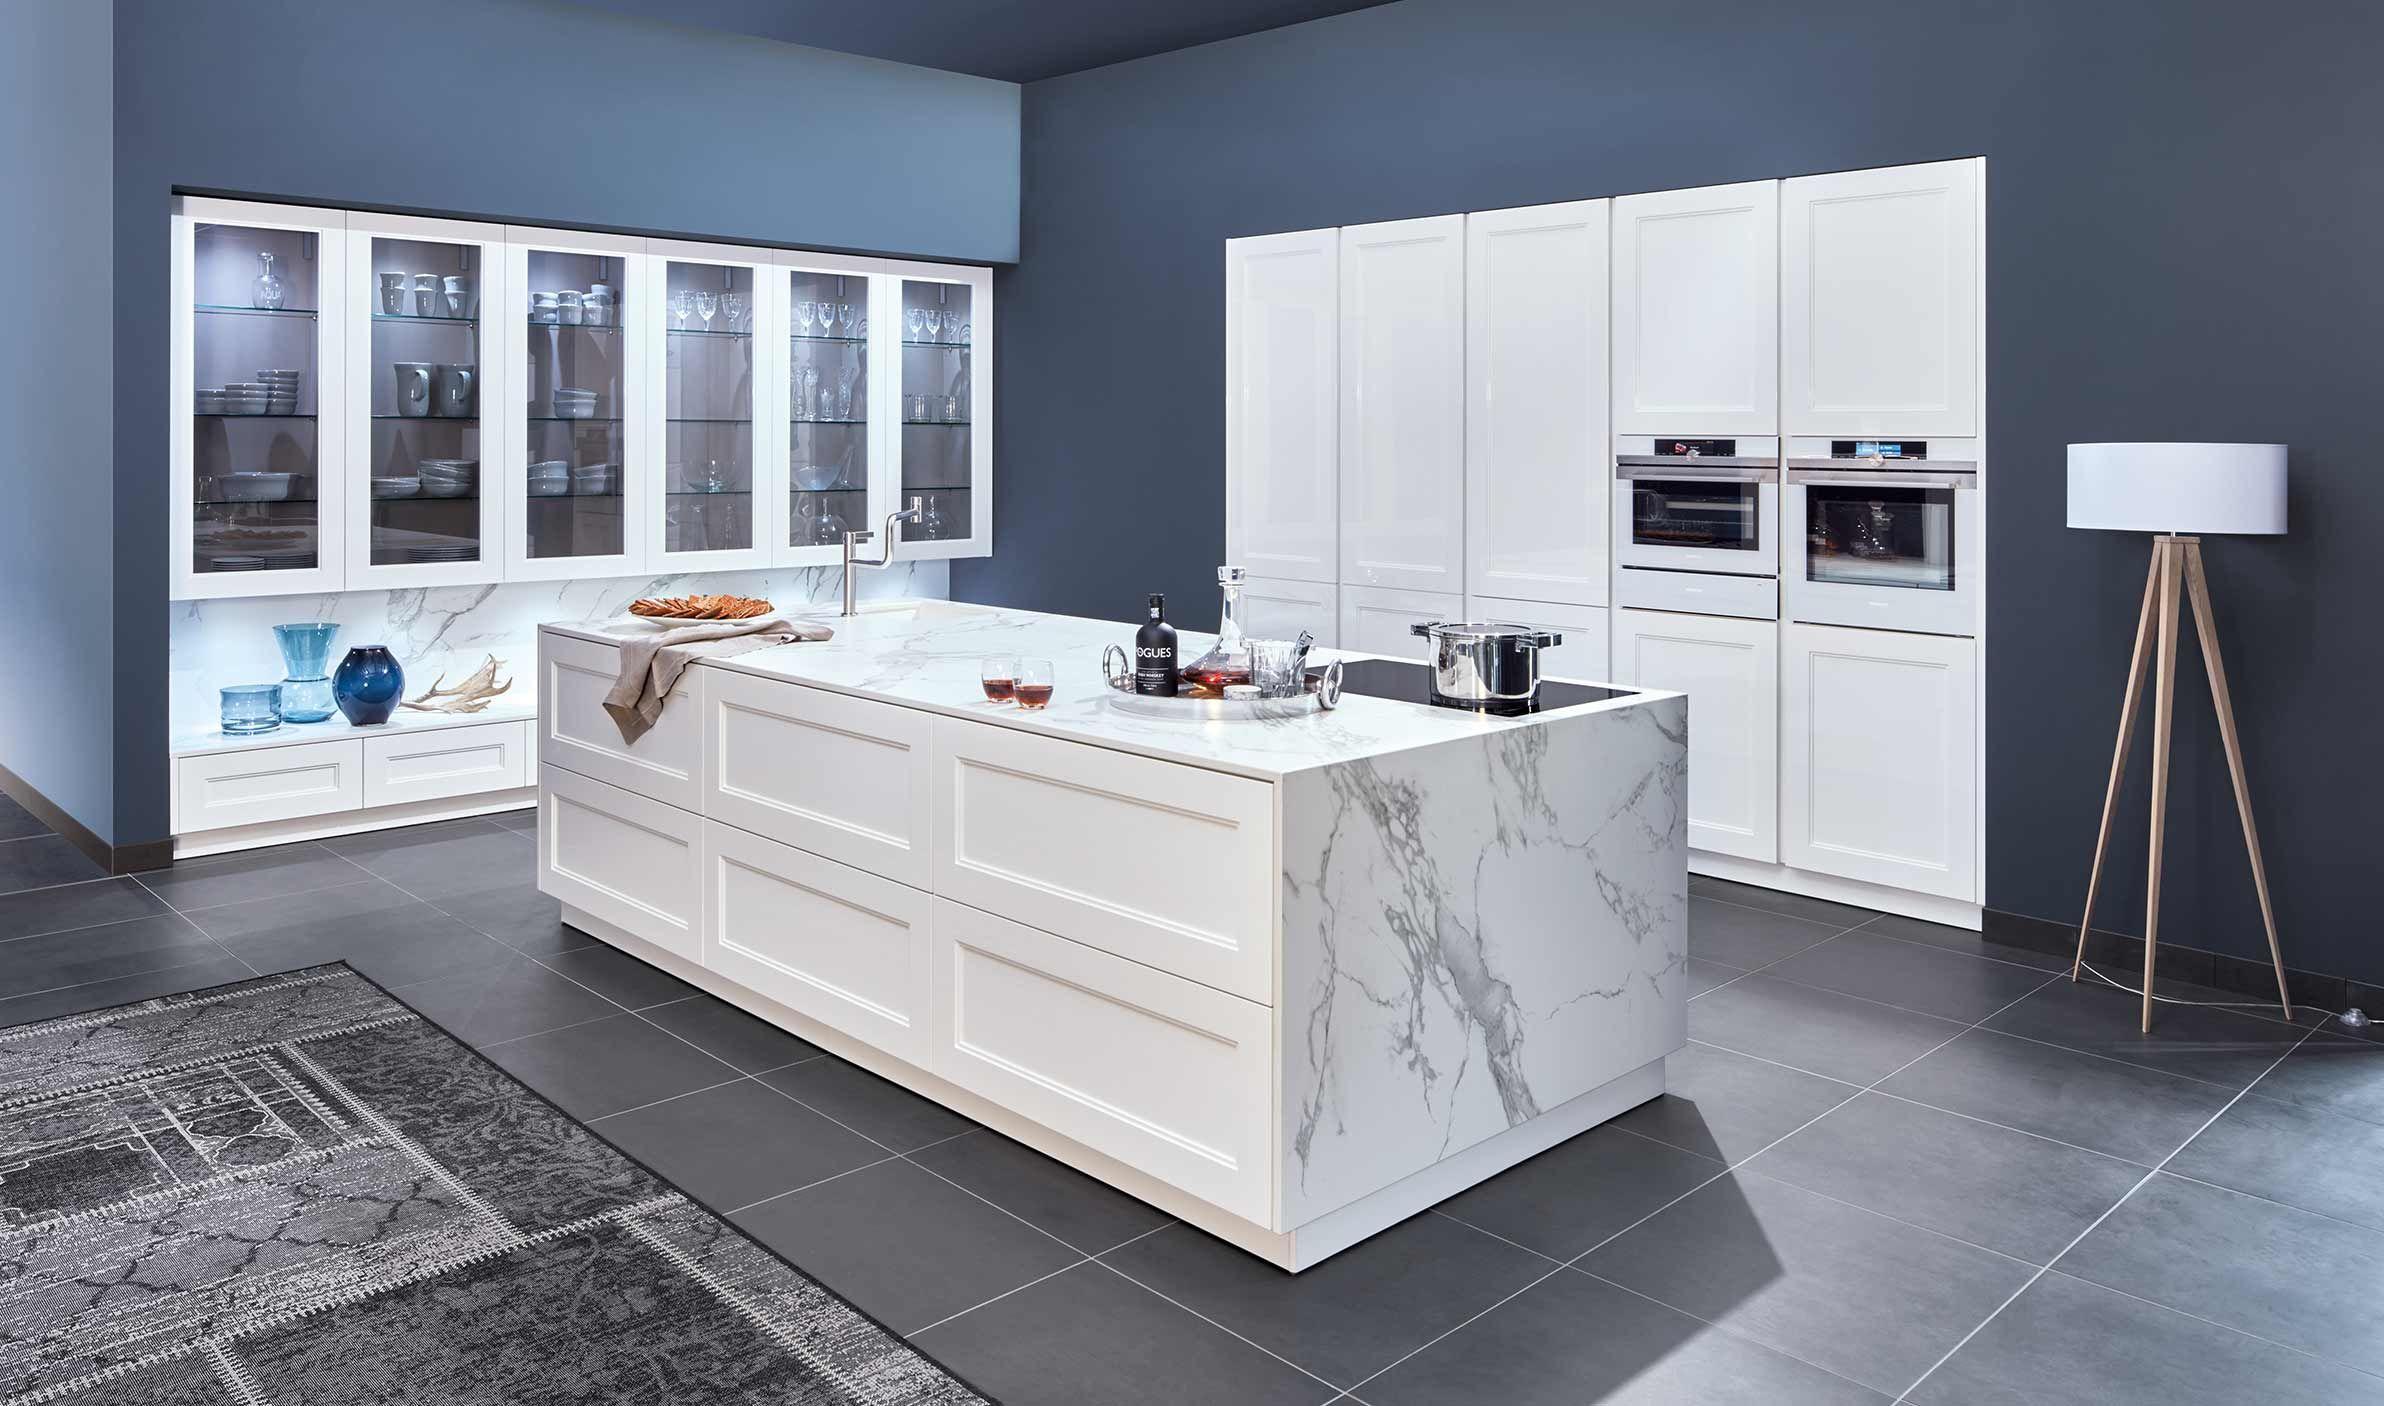 Full Size of A Classic Country Kitchen Zeyko Cottage In Glossy Clear White Küchen Regal Wohnzimmer Real Küchen